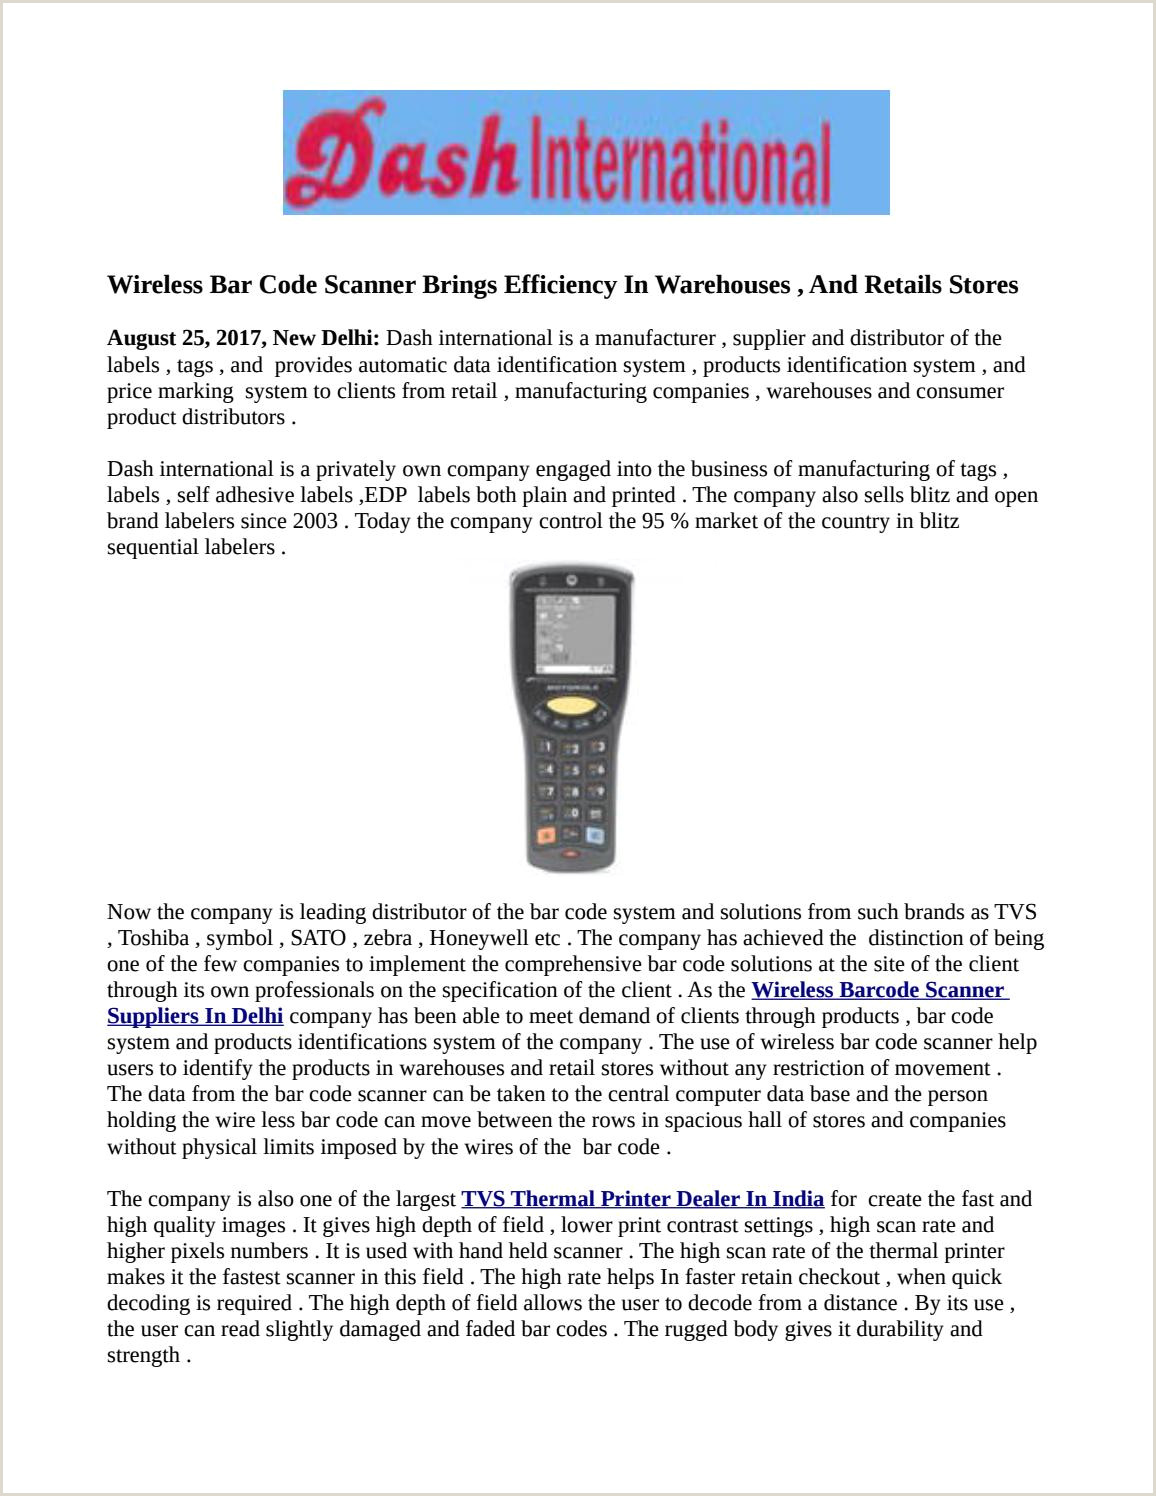 Cool Business To Start Wireless Bar Code Scanner Brings Efficiency In Warehouses